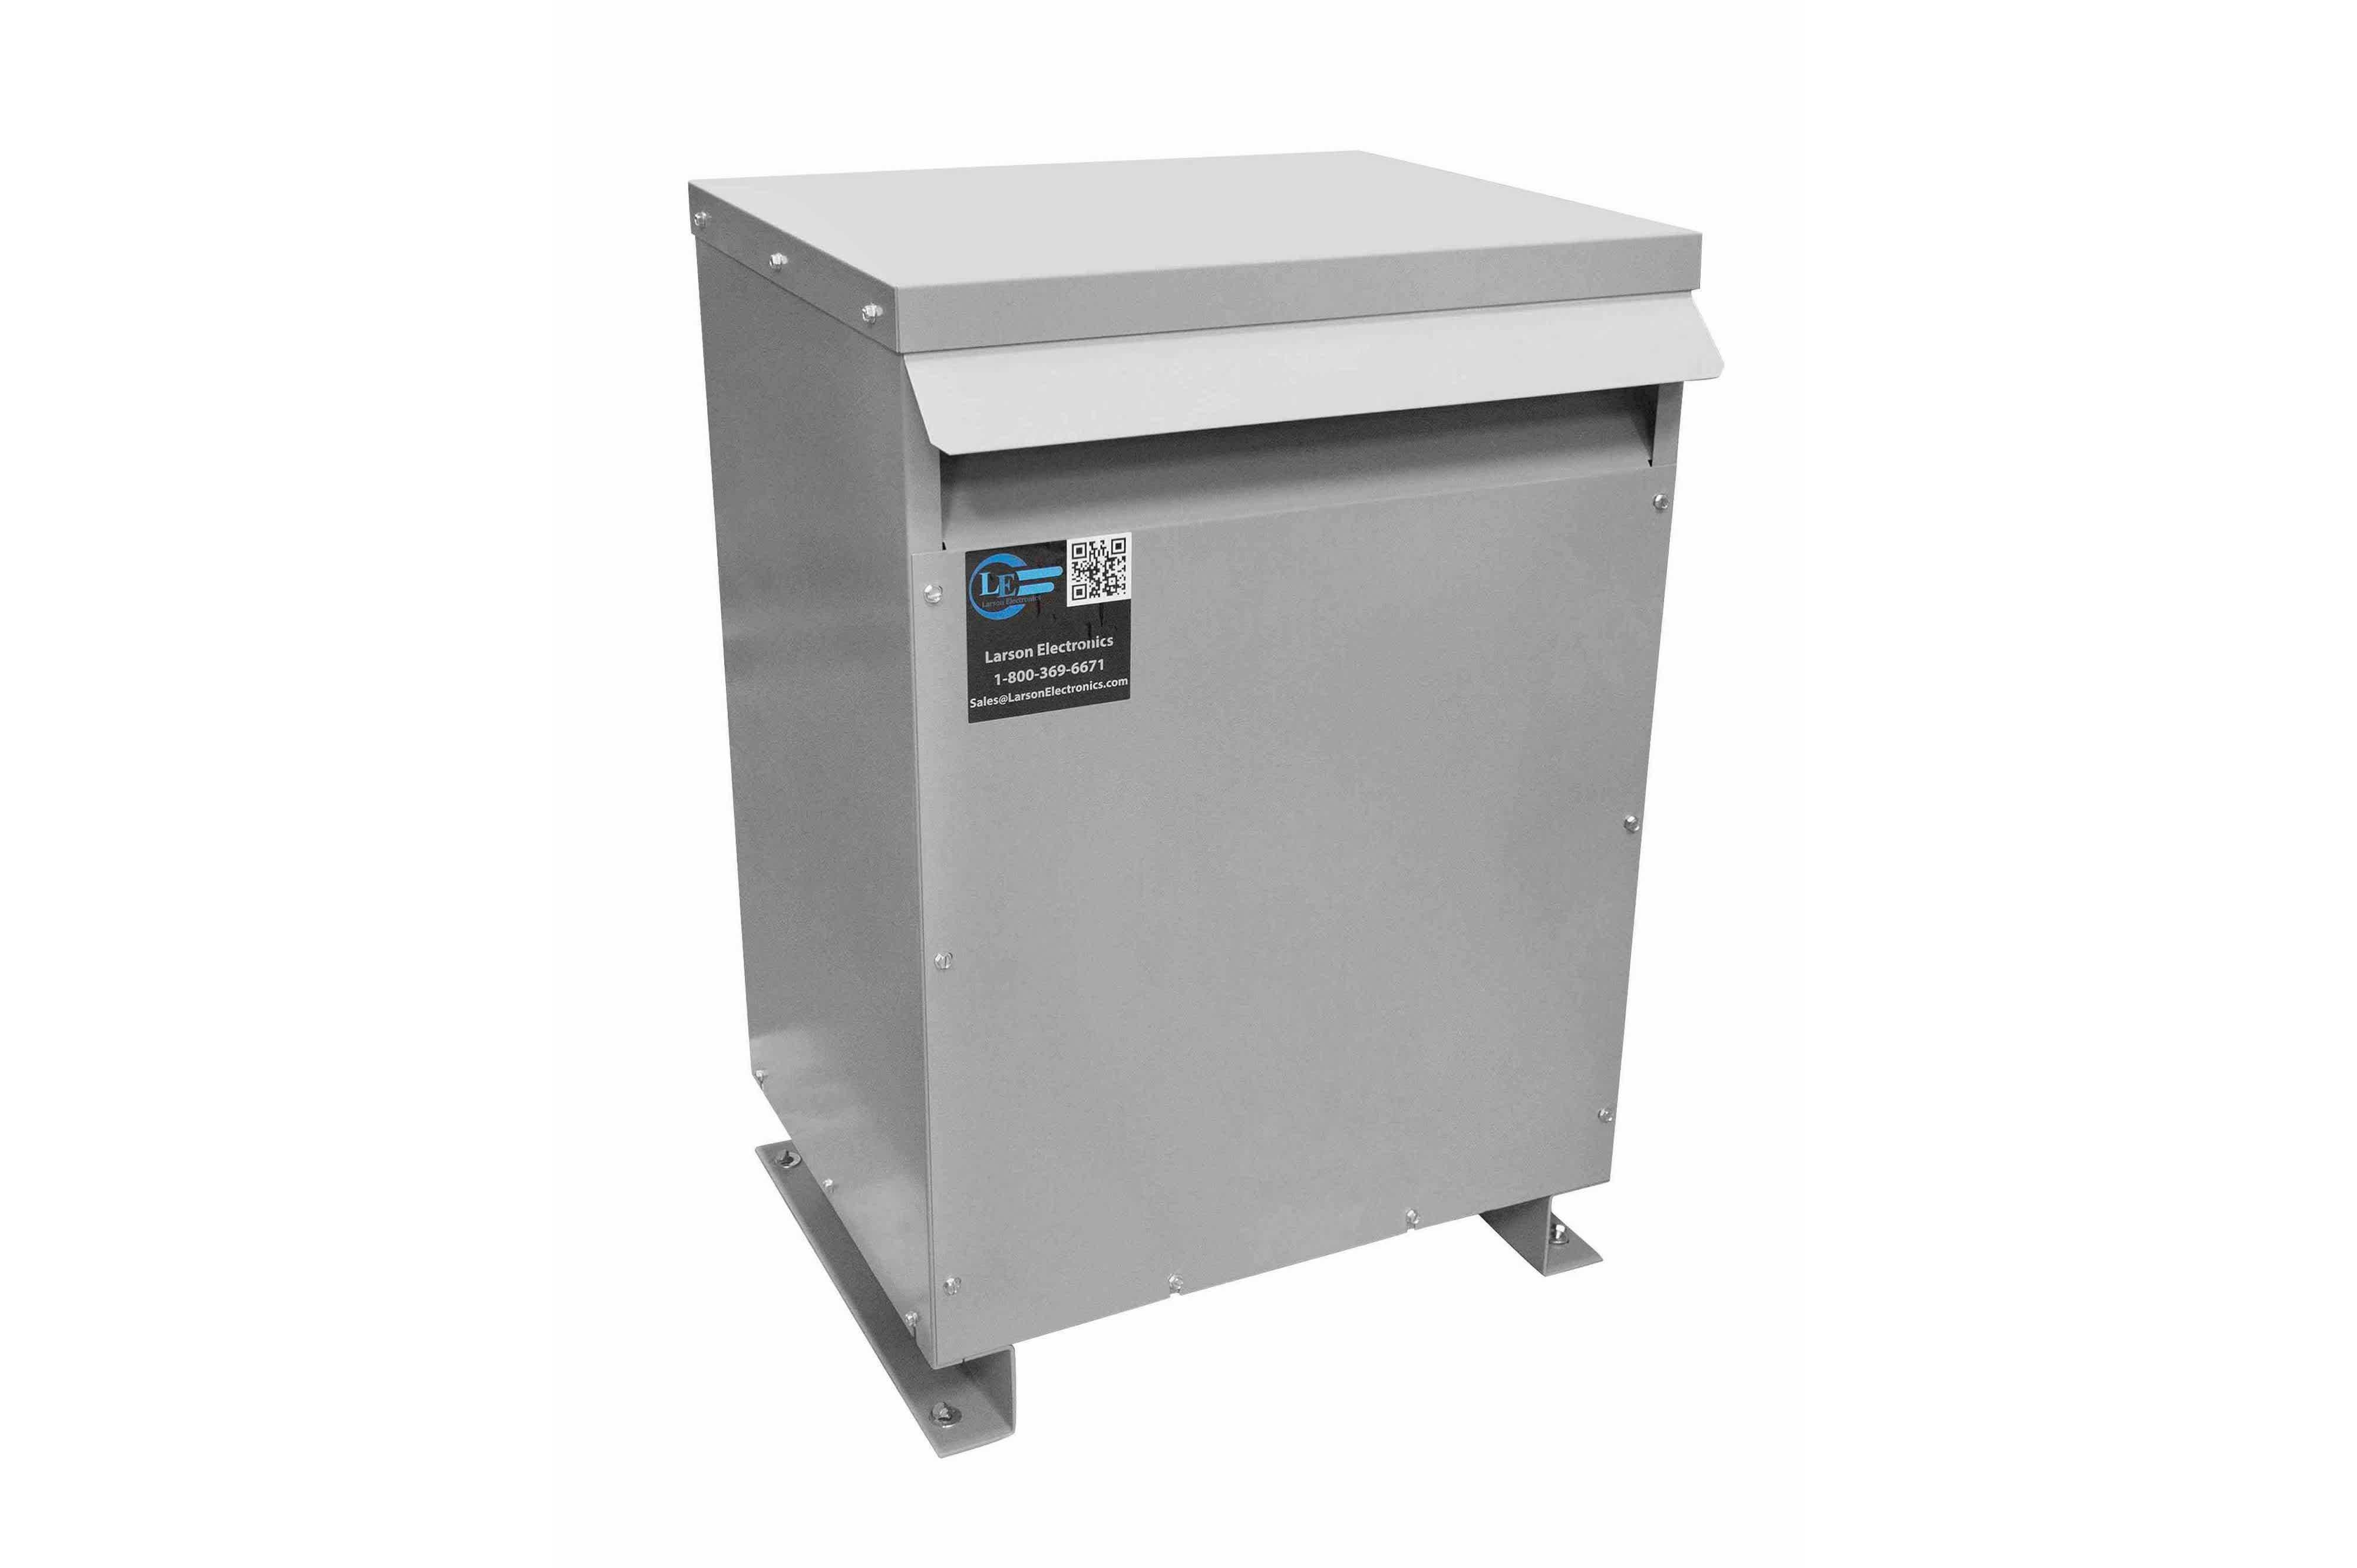 26 kVA 3PH Isolation Transformer, 460V Wye Primary, 575V Delta Secondary, N3R, Ventilated, 60 Hz